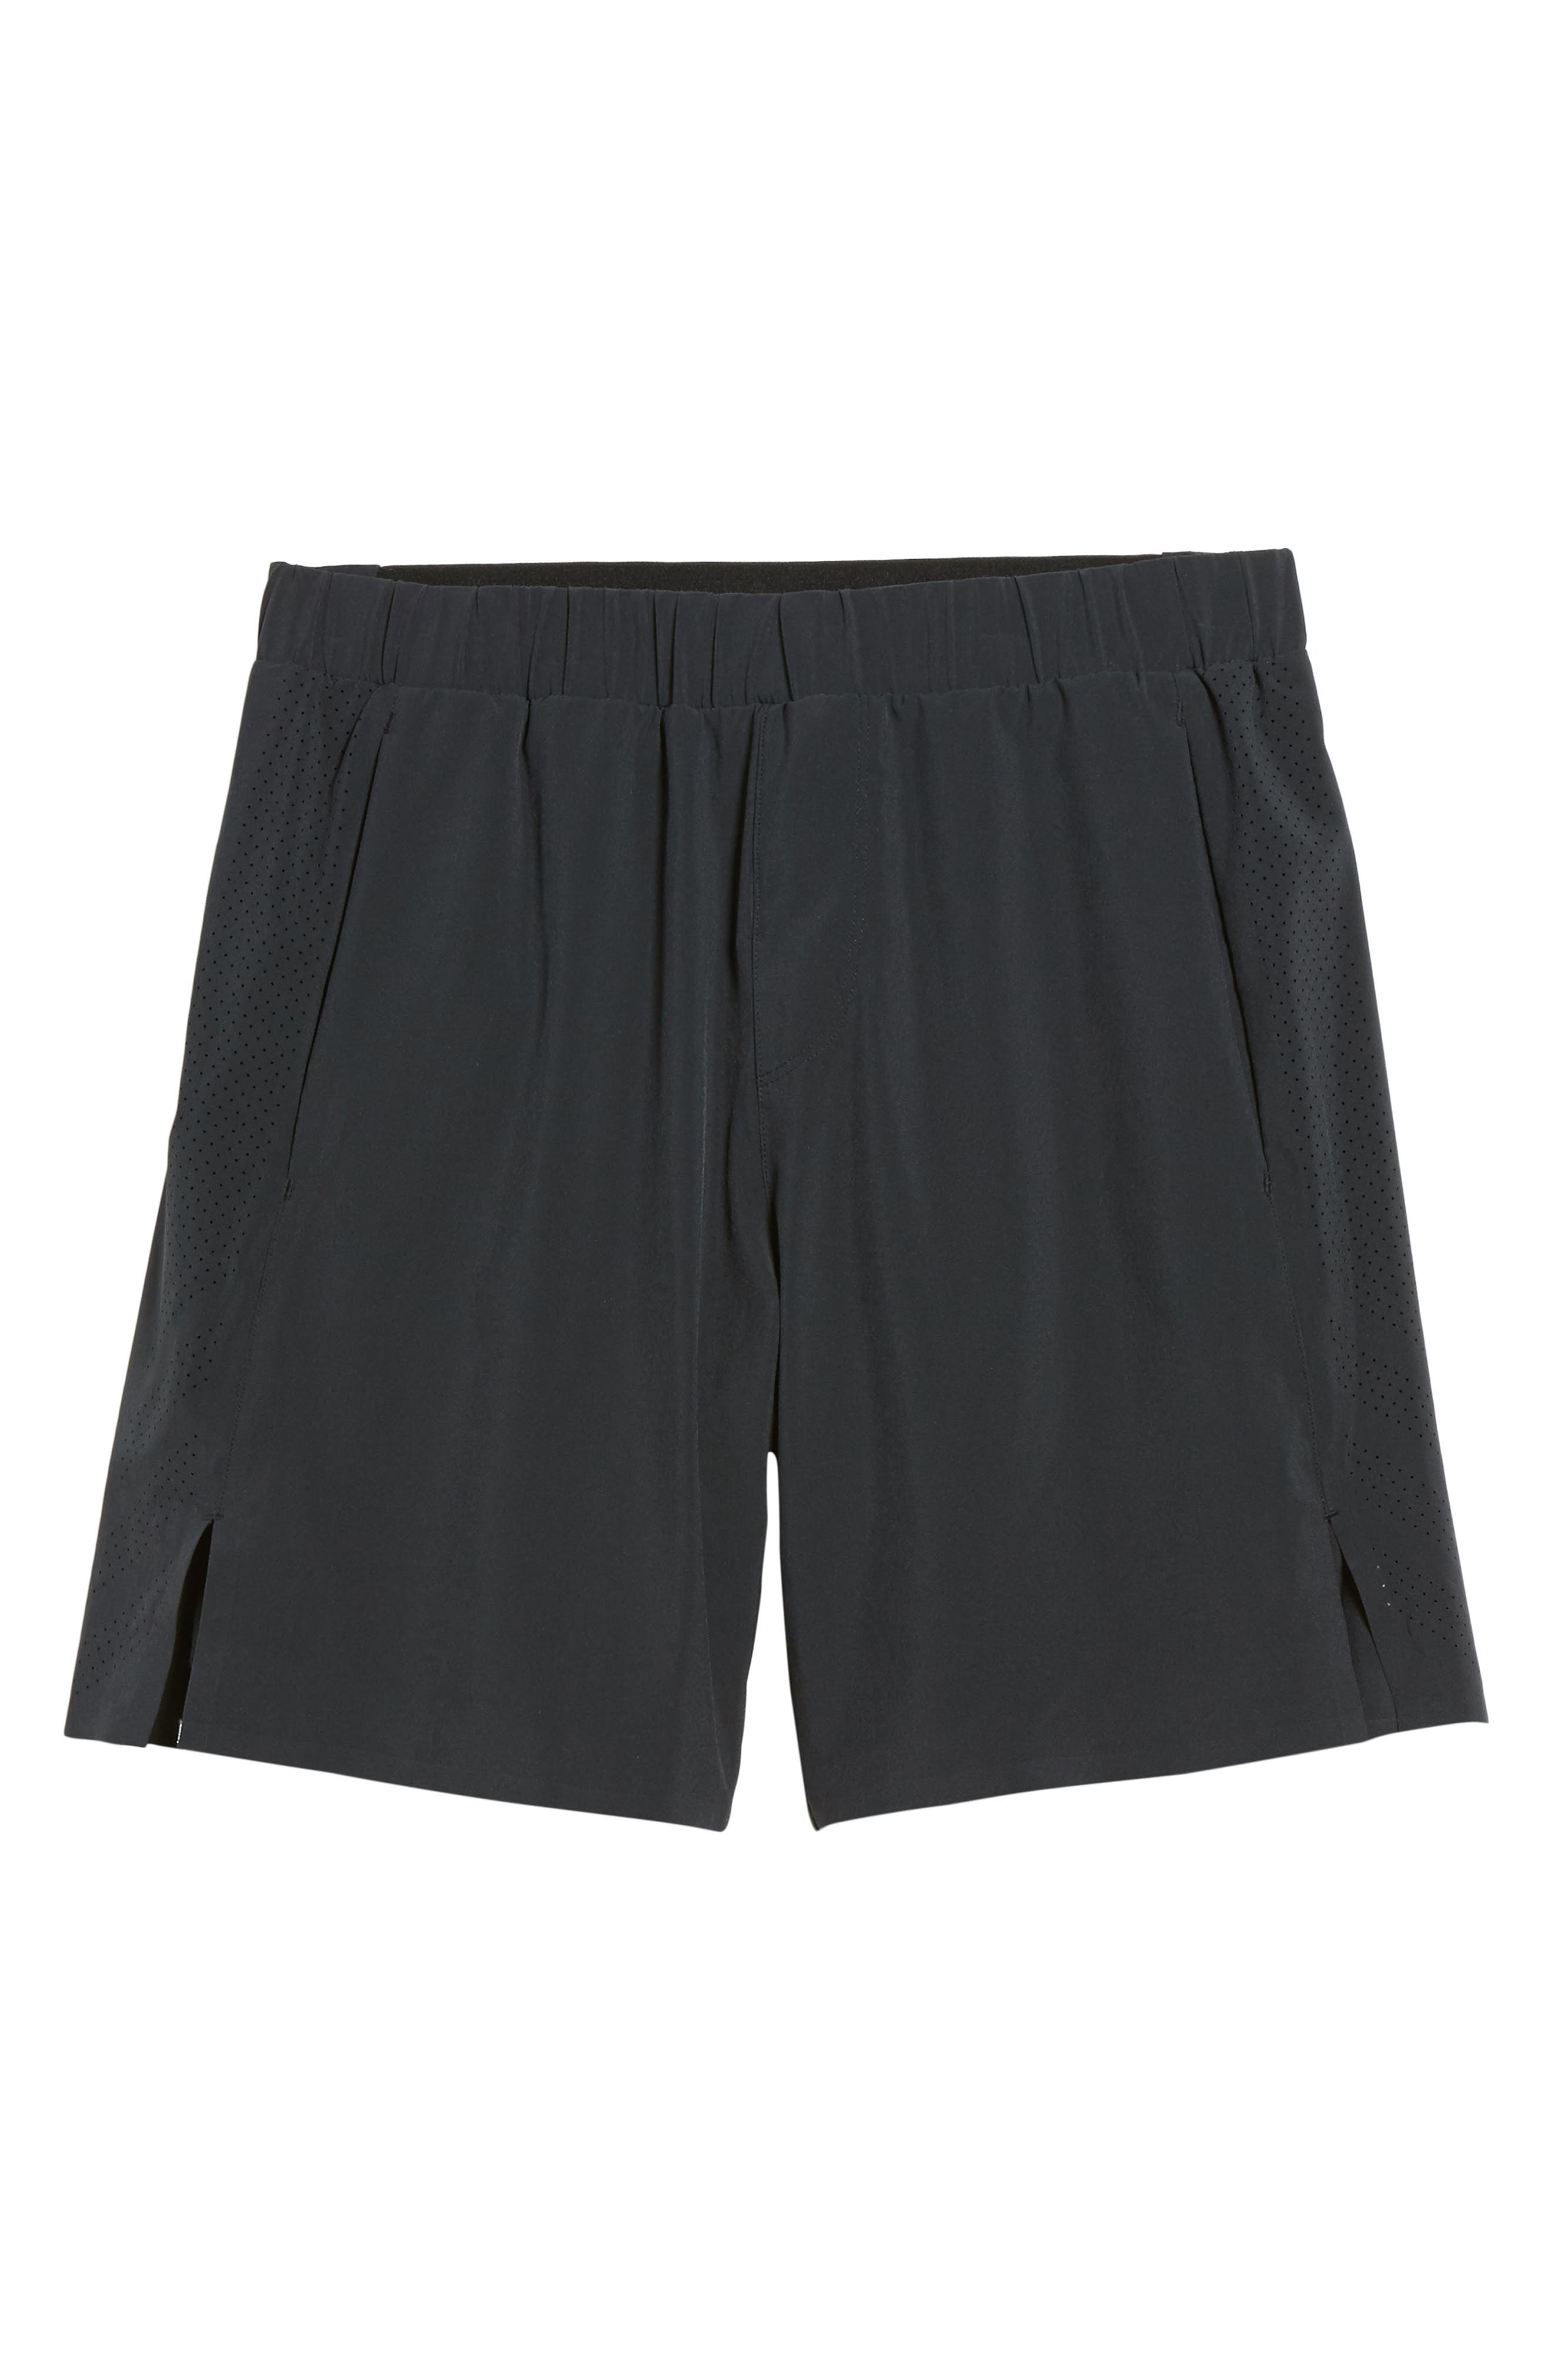 Interval 2-in-1 Shorts,                             Alternate thumbnail 6, color,                             Black